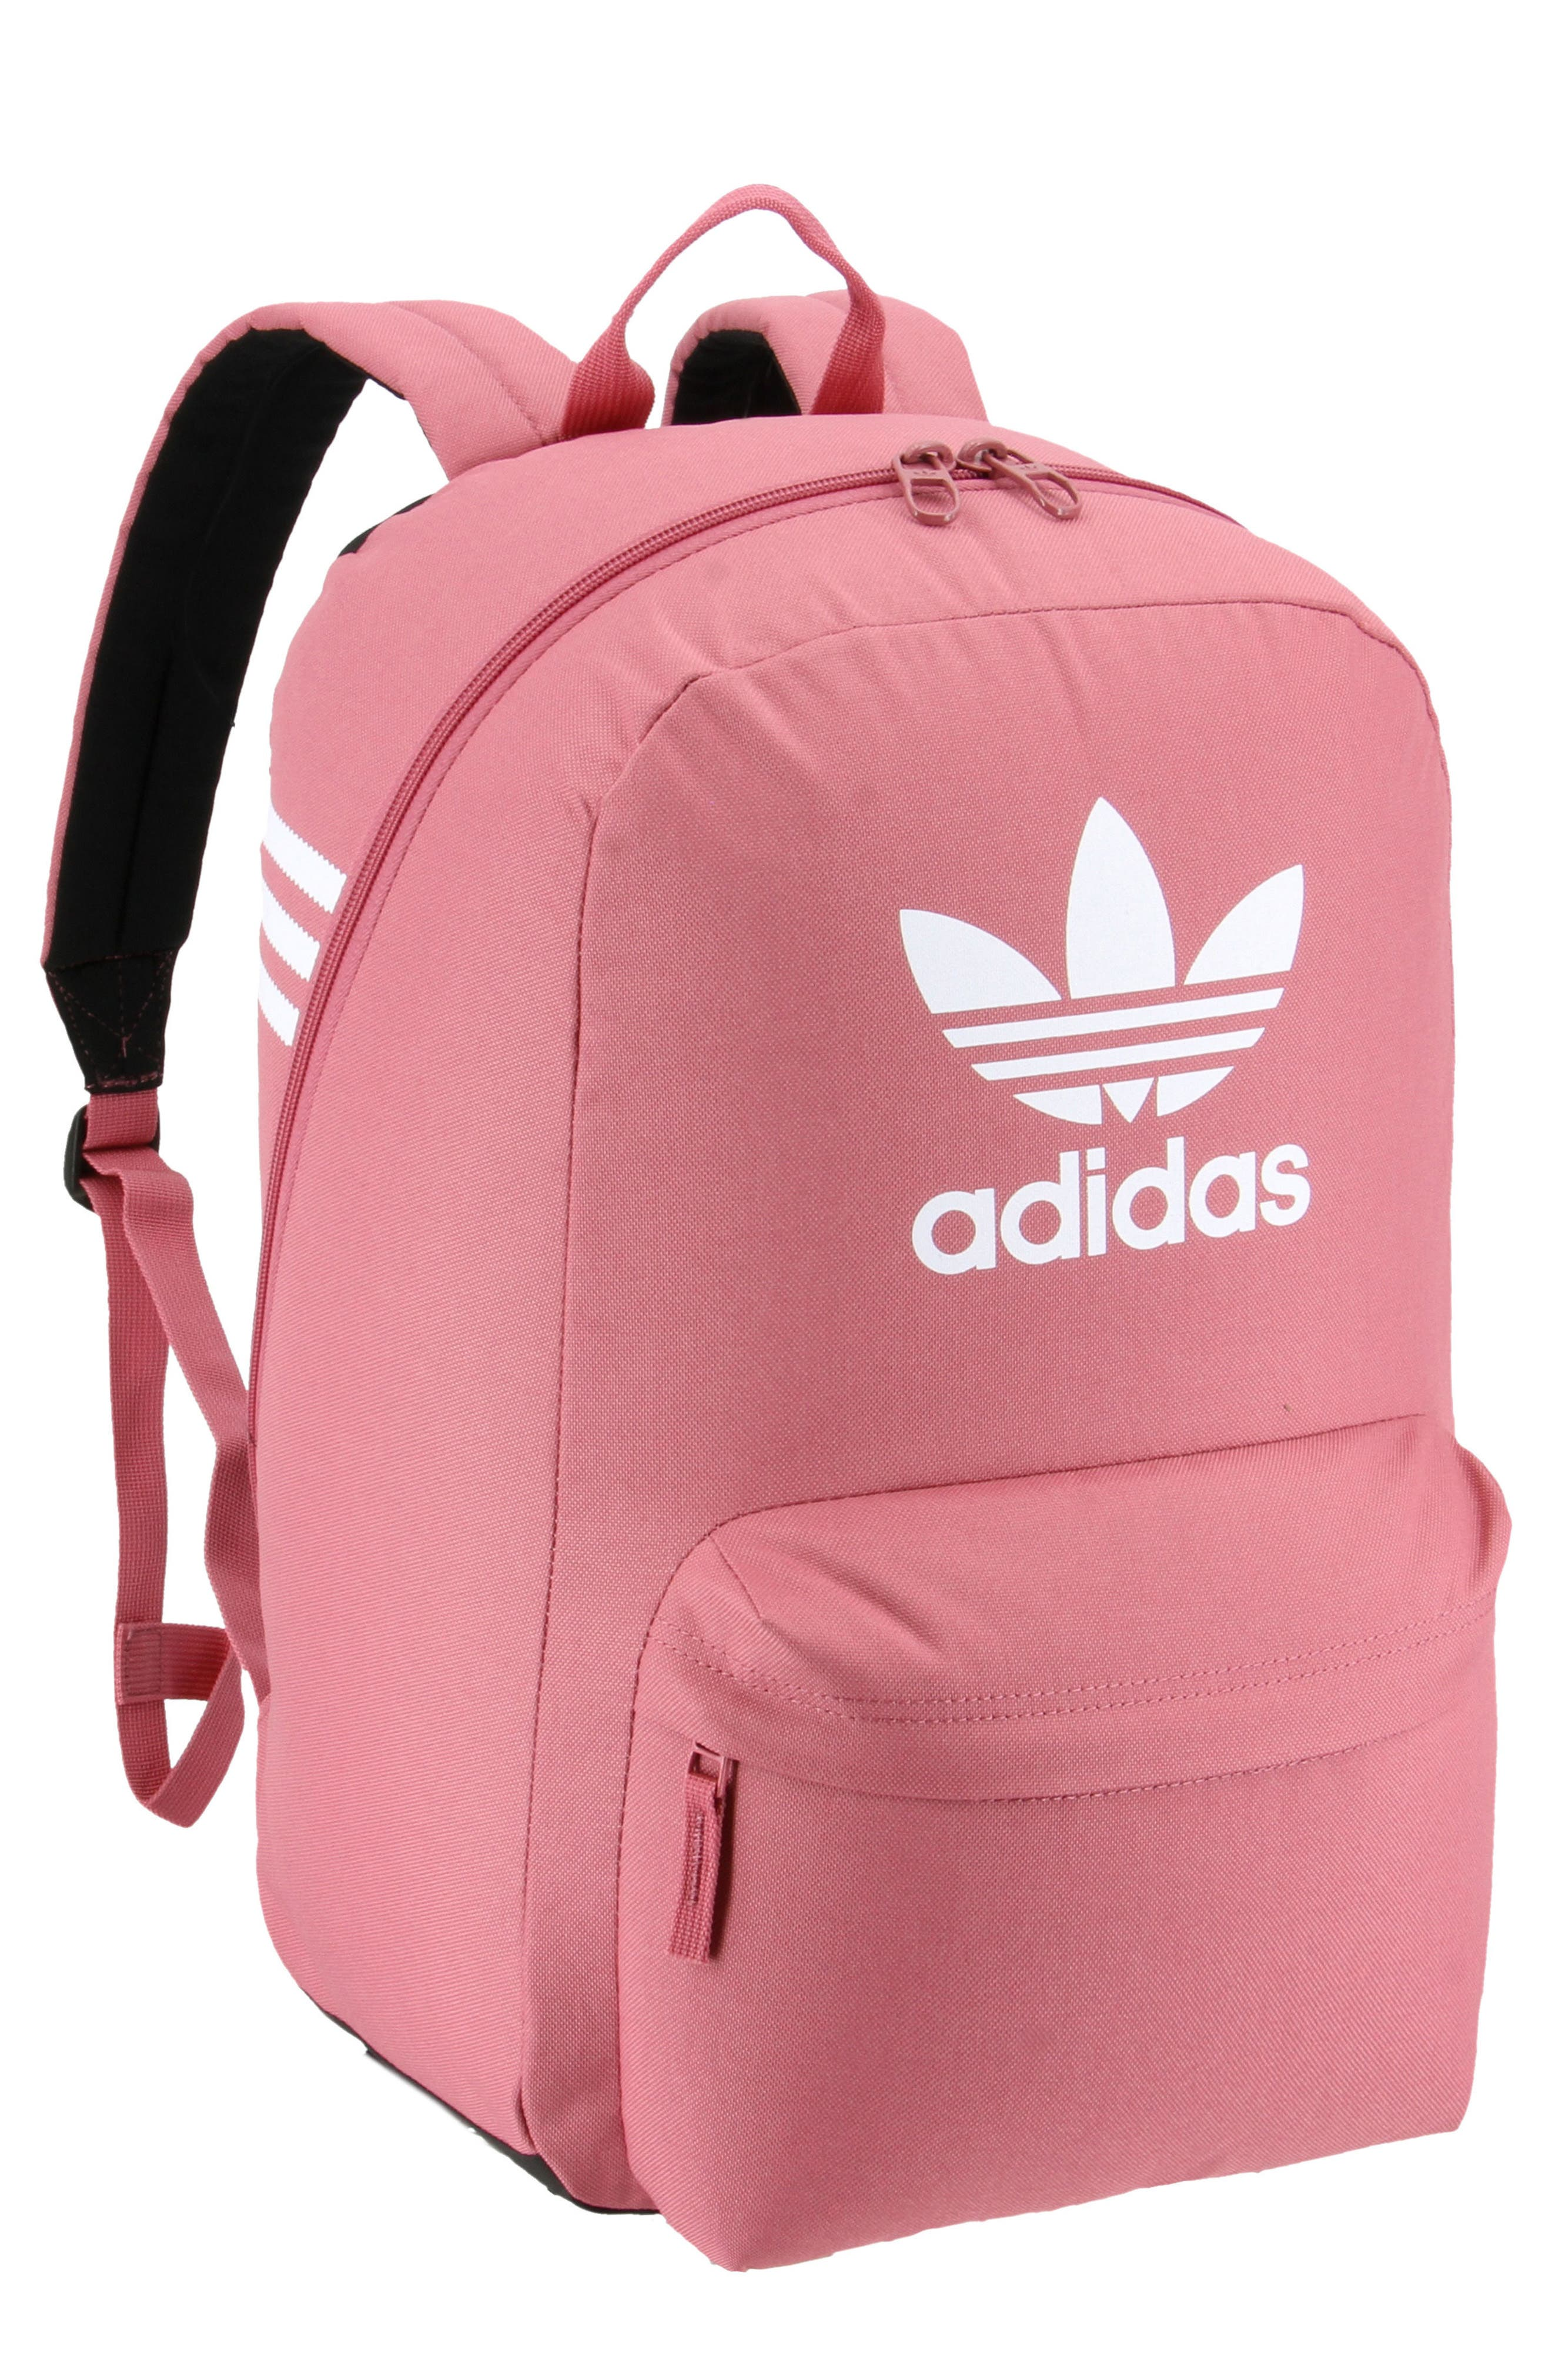 Adidas Originals Big Logo Backpack - Red